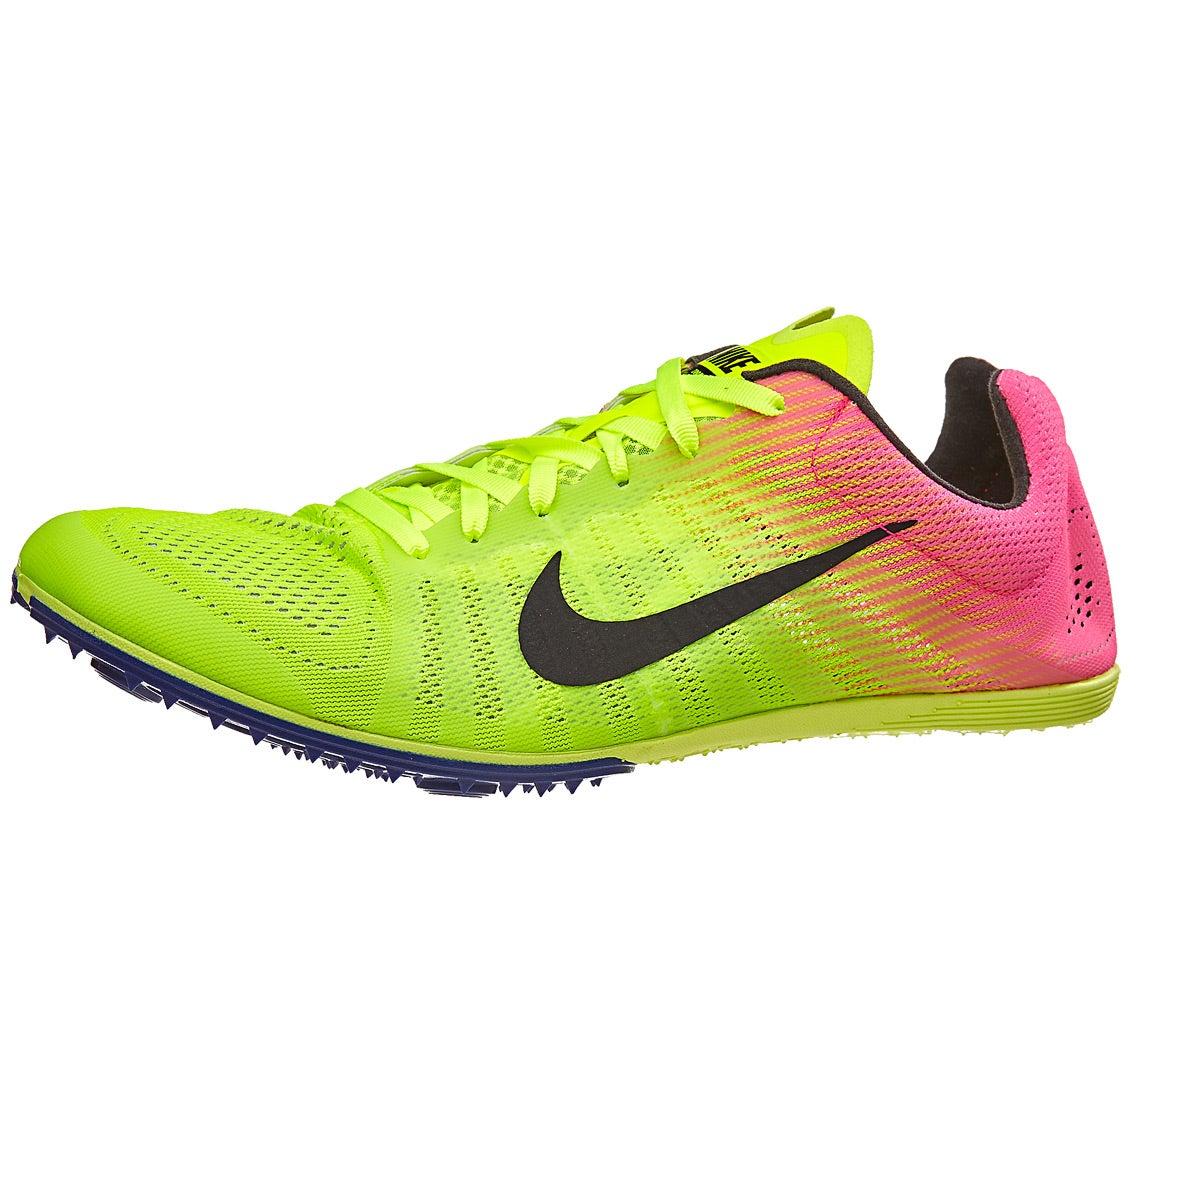 136dc4b1e08 Nike Zoom D OC Unisex Spikes Multi-Color 360° View